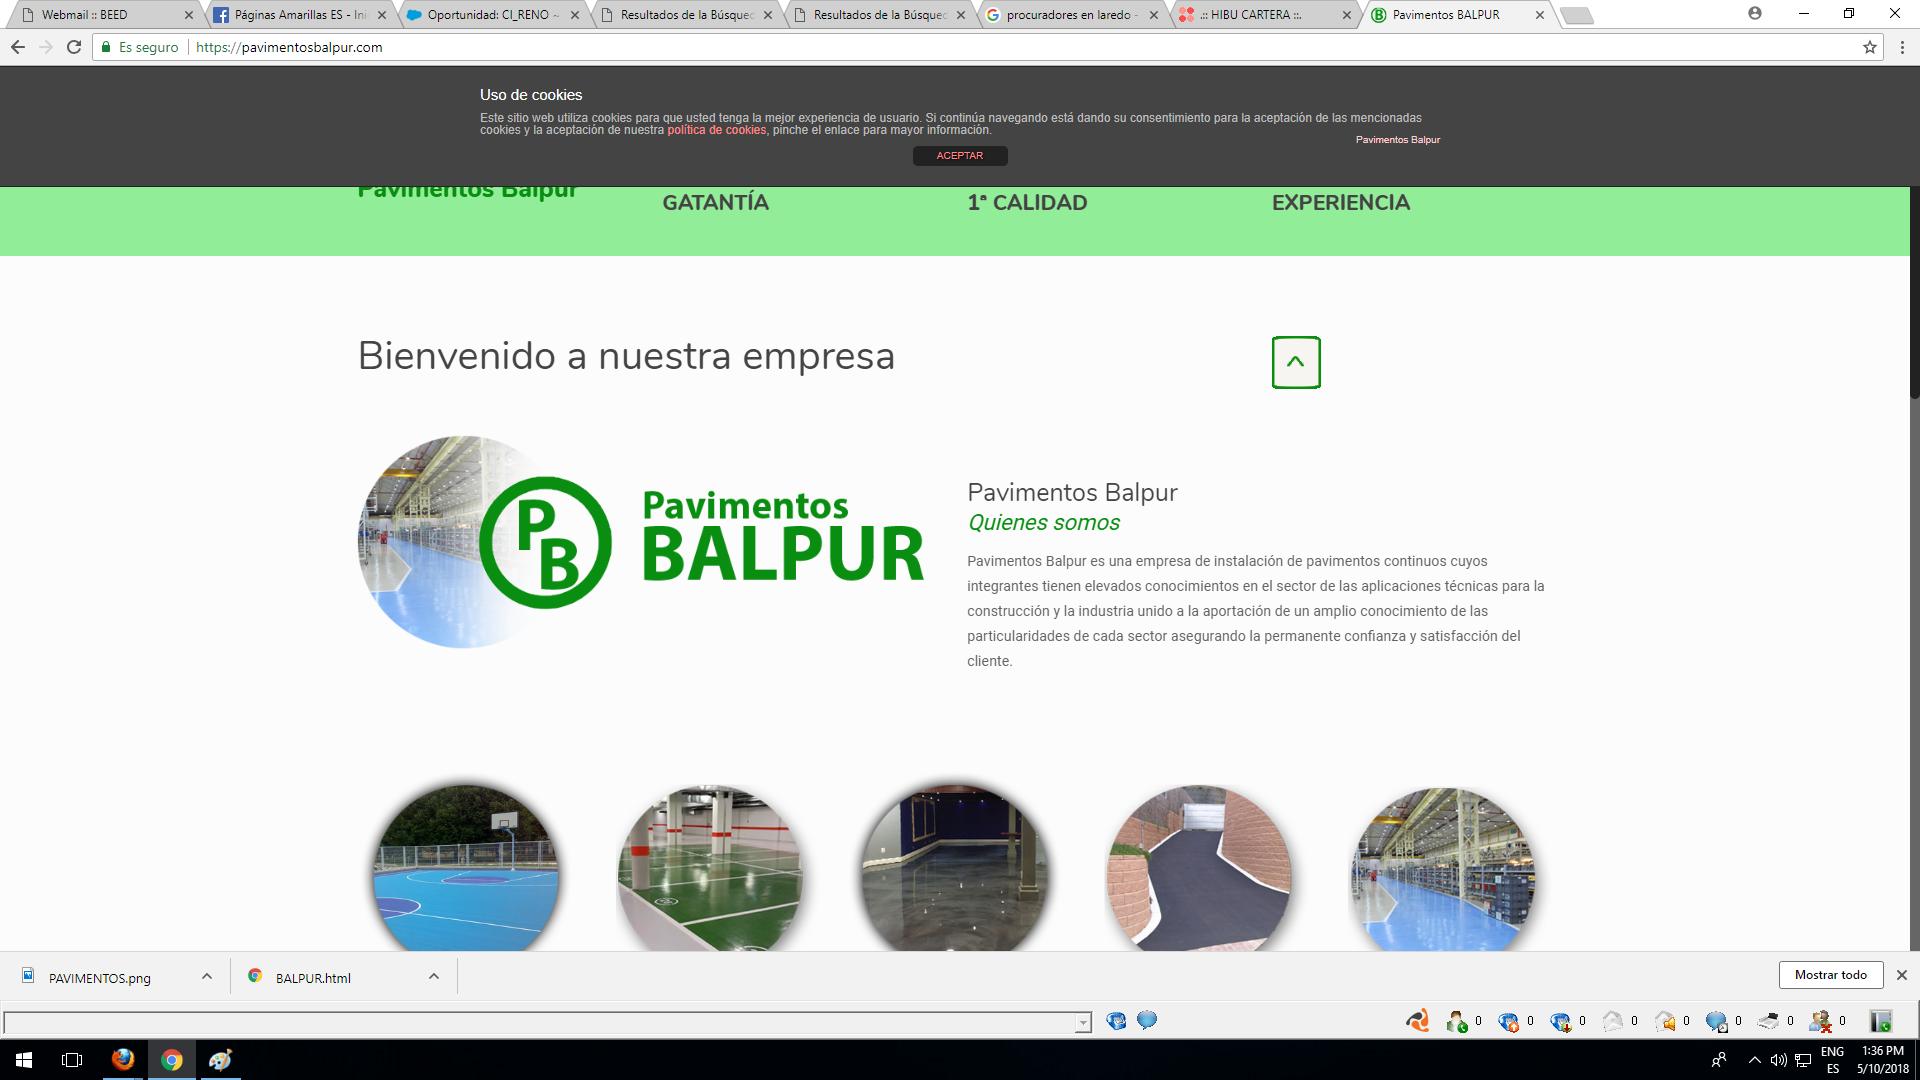 Pavimentos Balpur